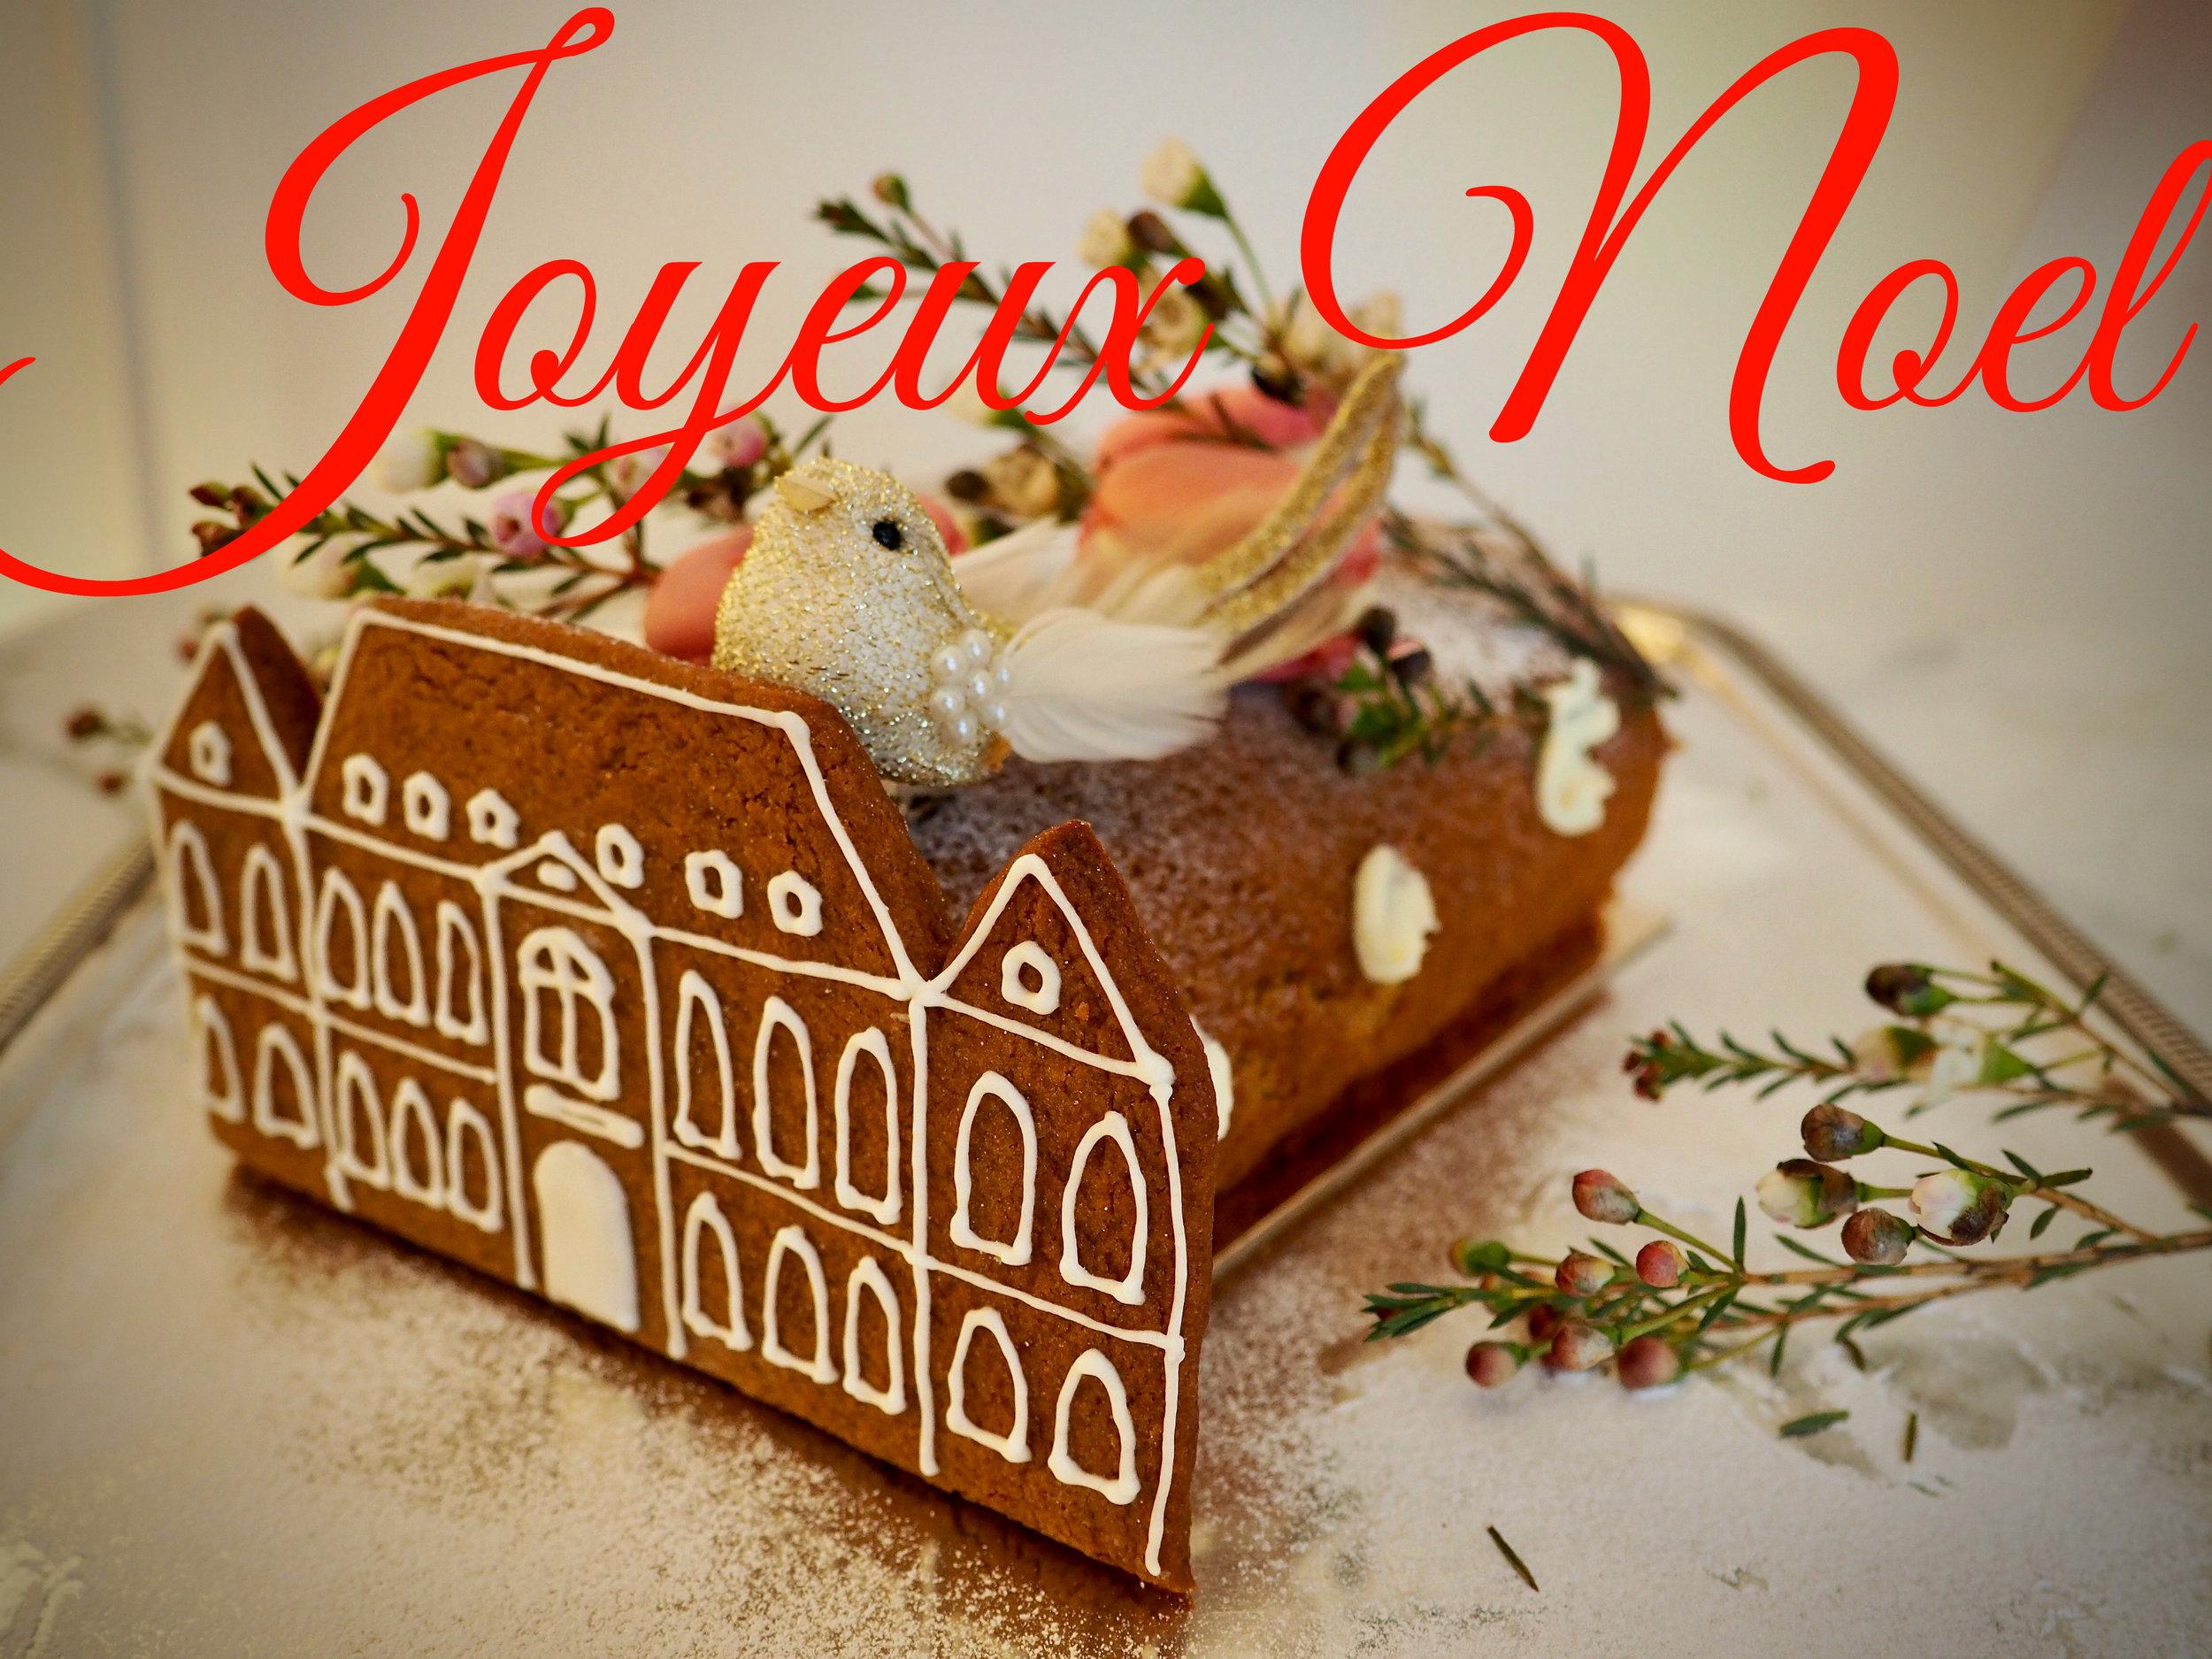 Thank you Molly for the very first Château Buche de Noël x